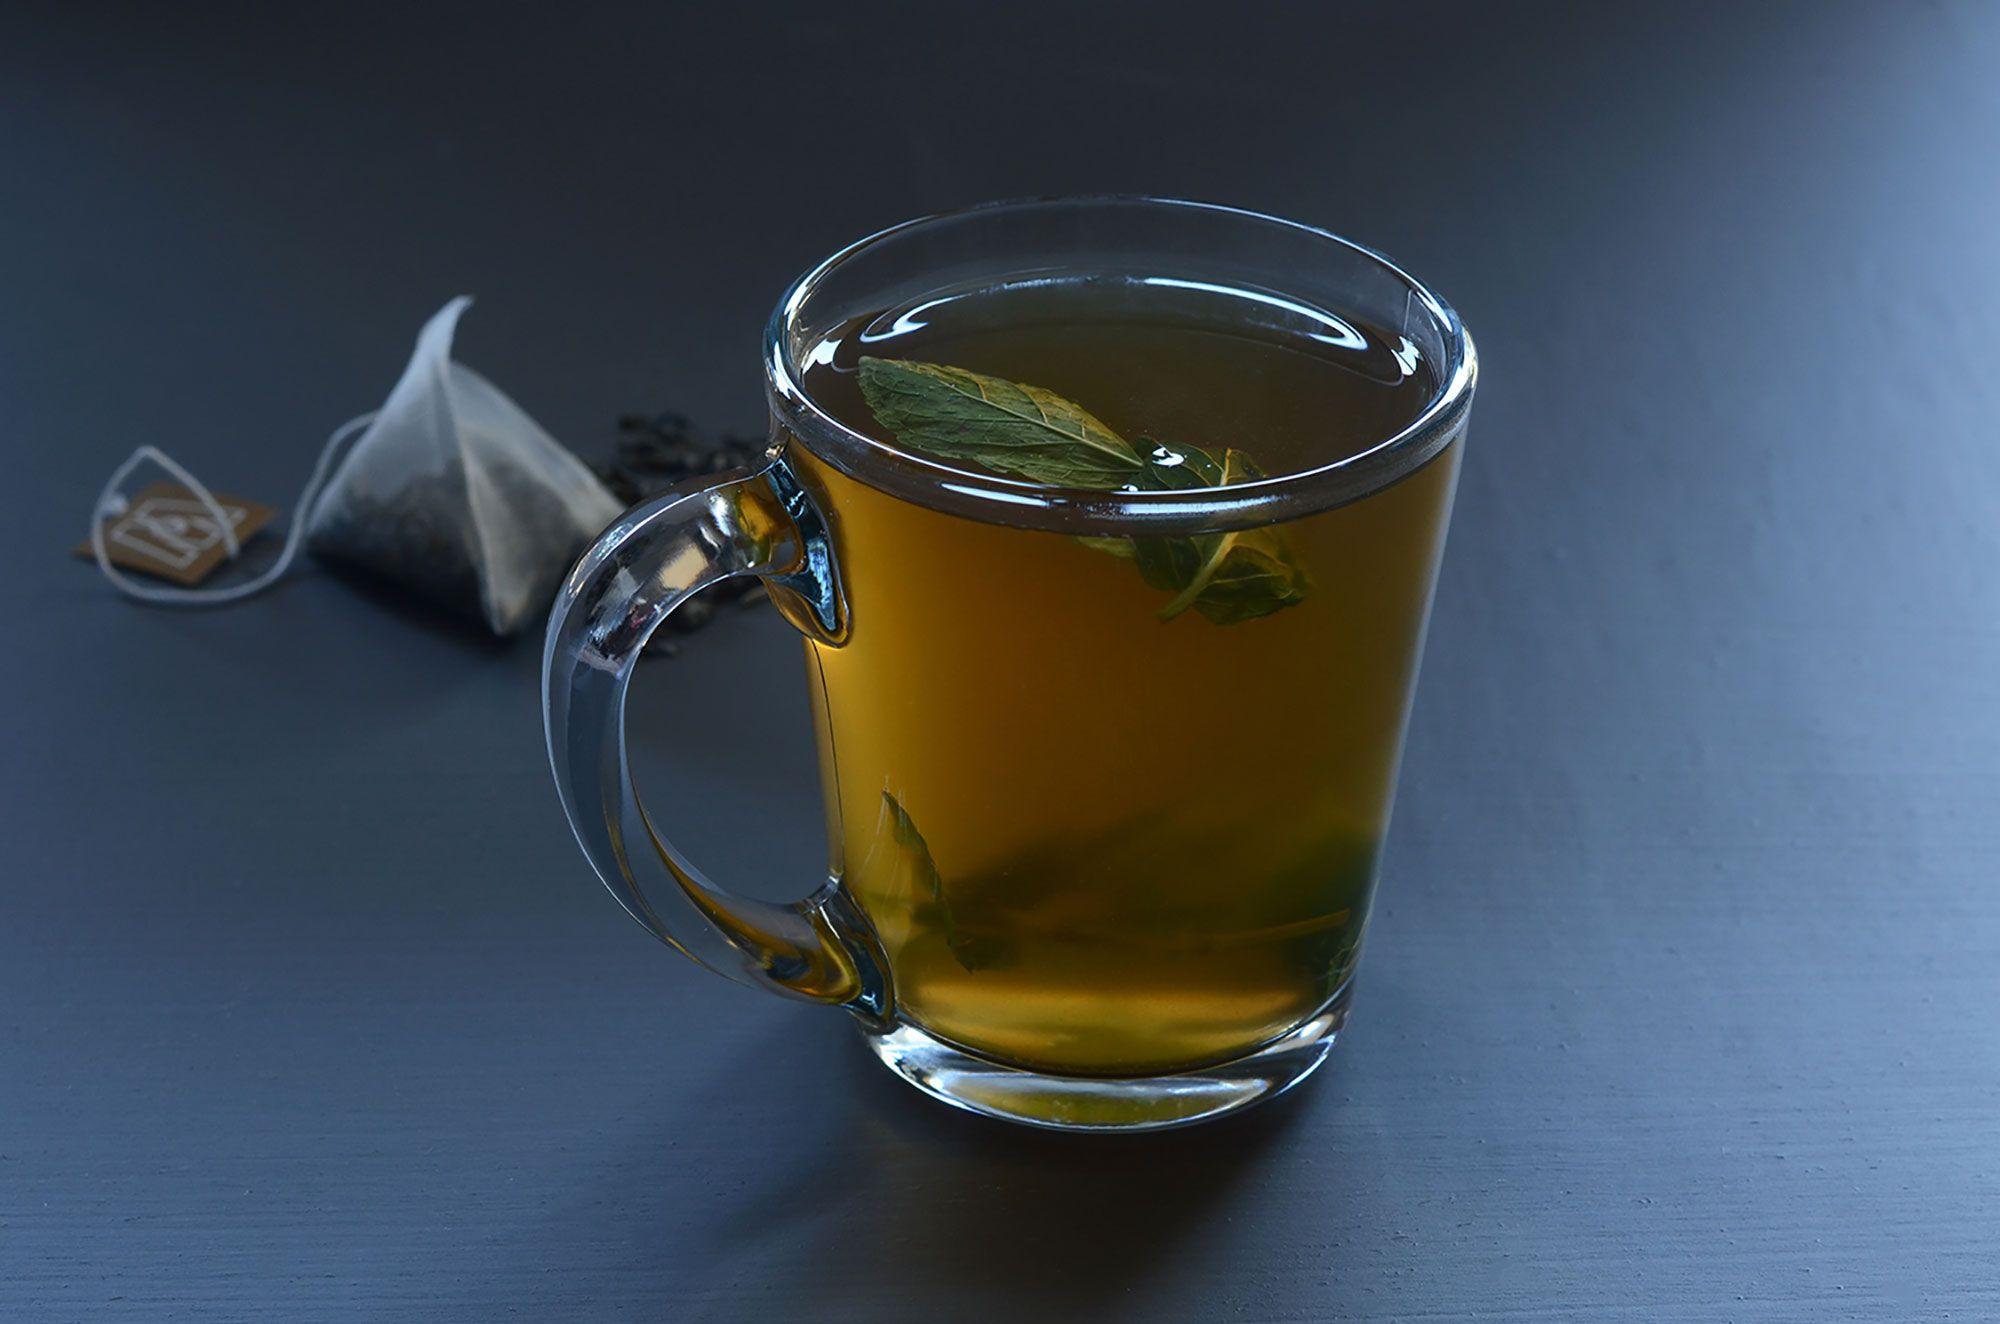 Refreshing ginger and mint steep in antioxidant abundant